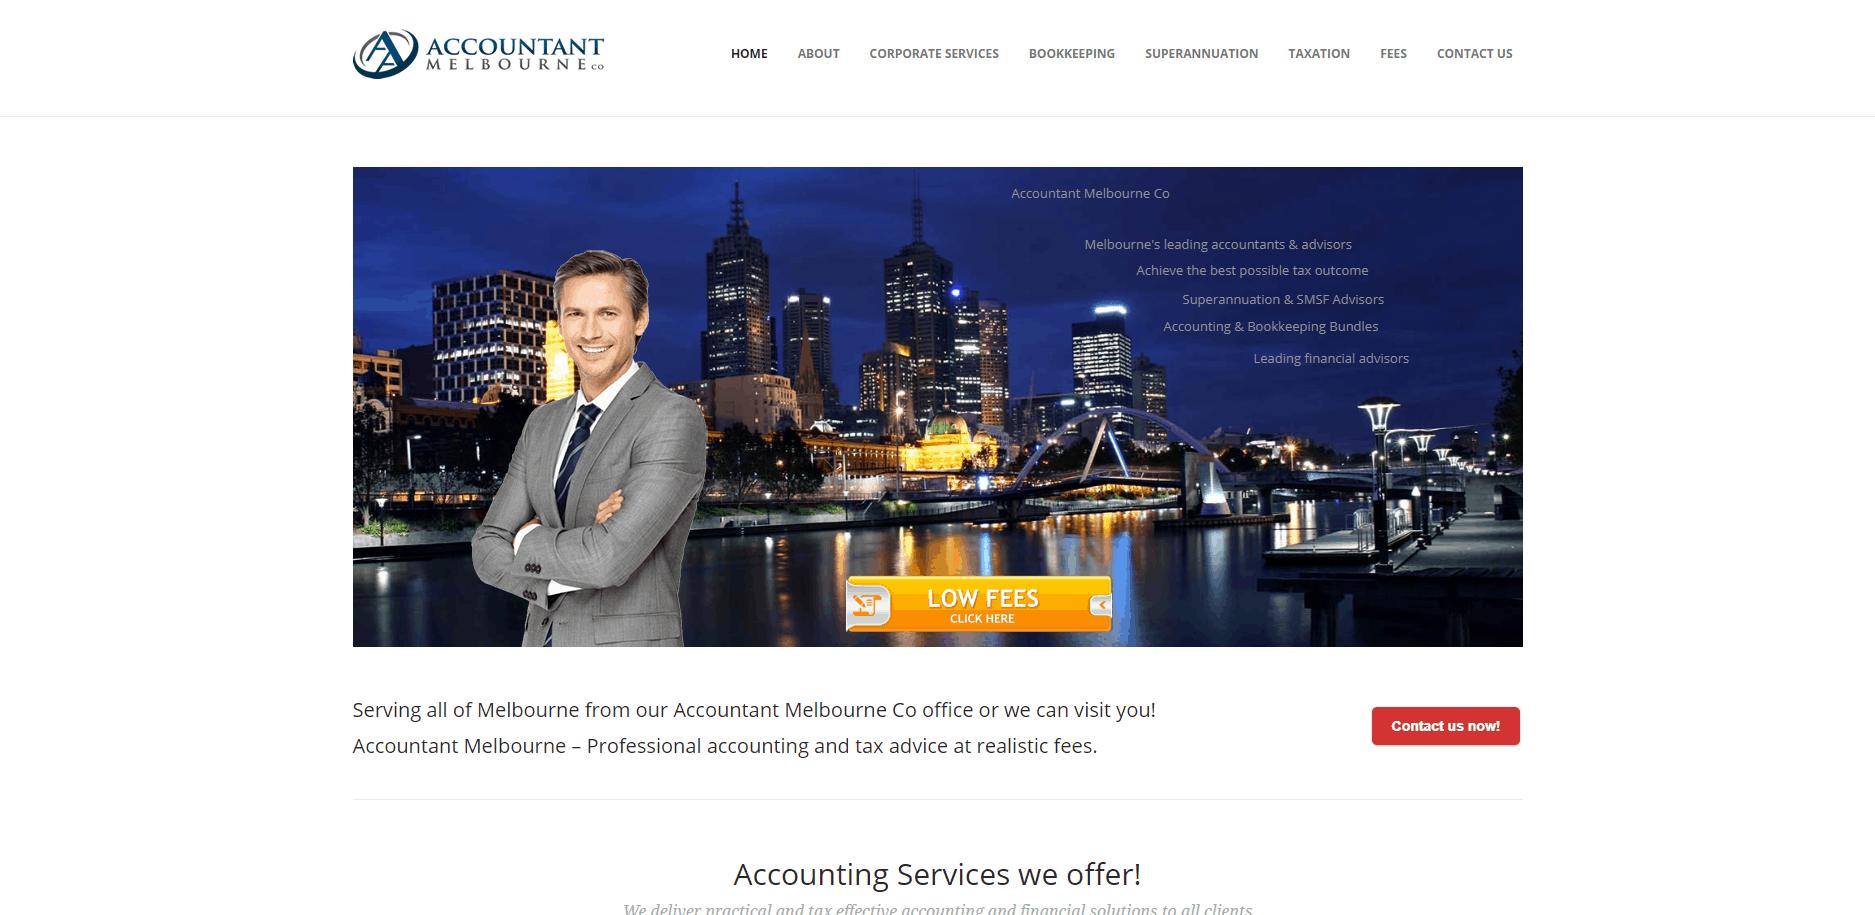 Accountant Melbourne Co